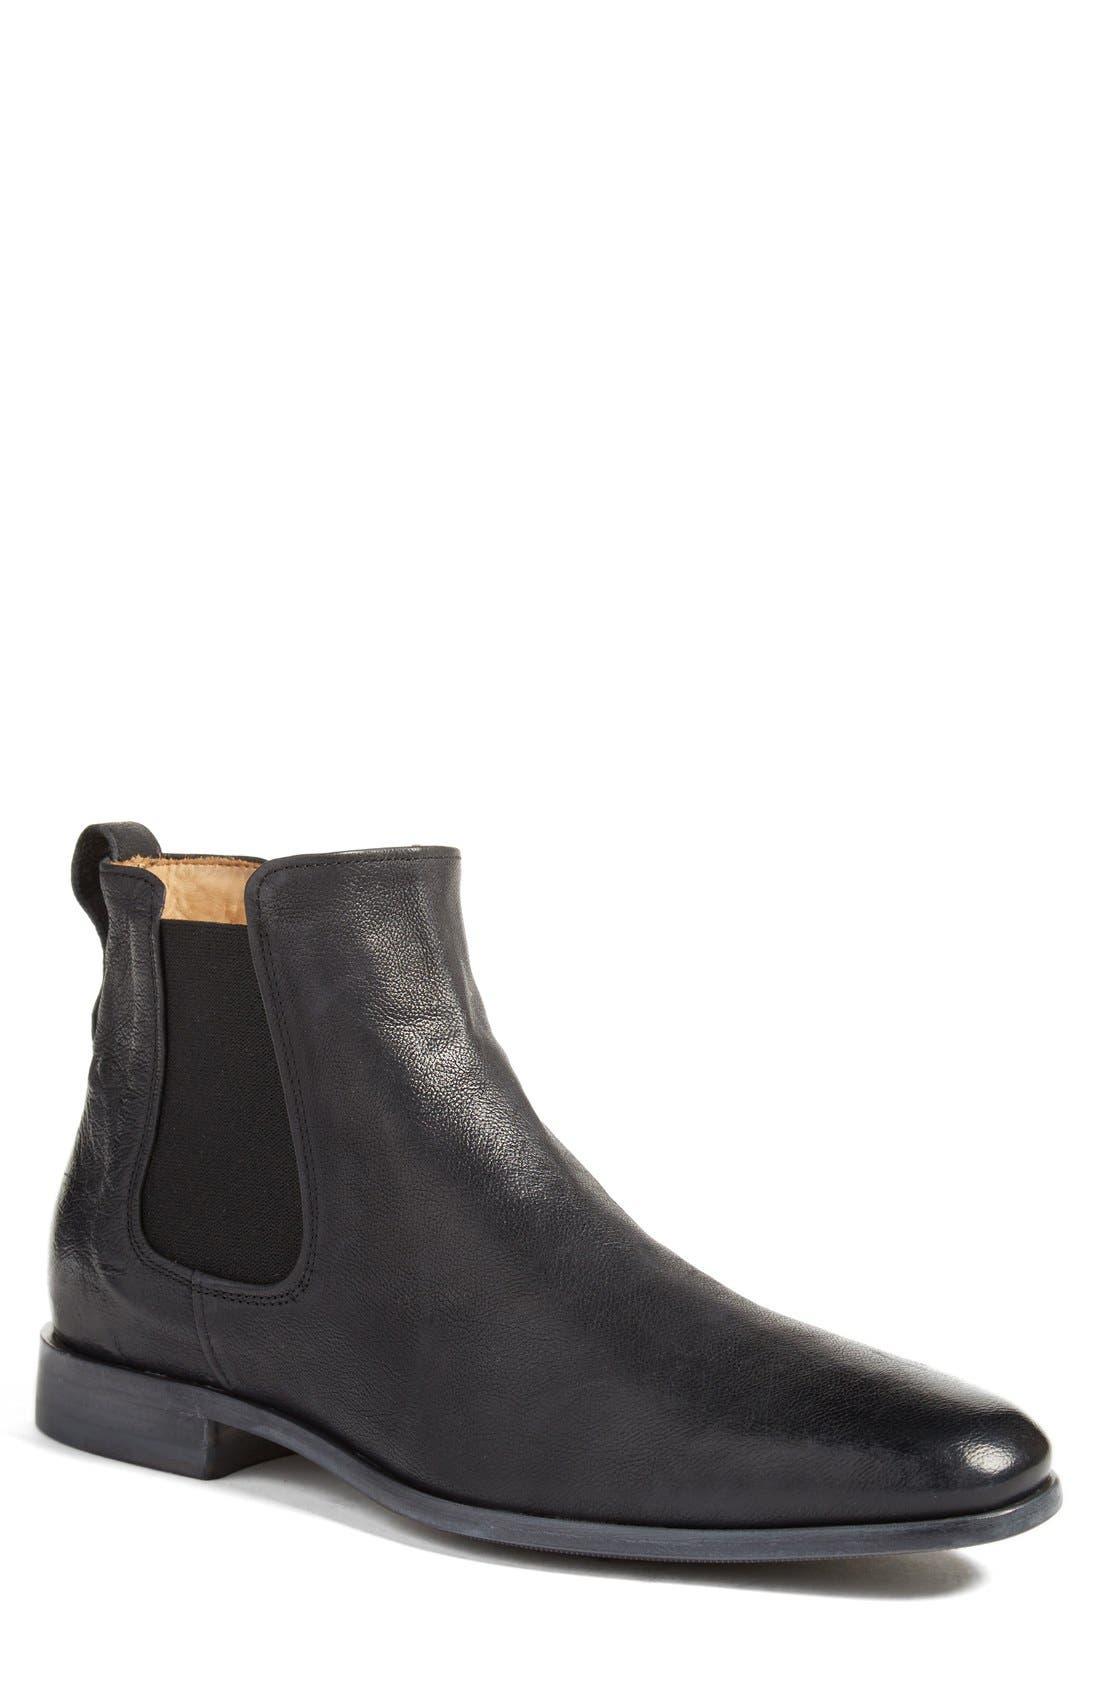 Arthur Chelsea Boot,                         Main,                         color, Black Leather